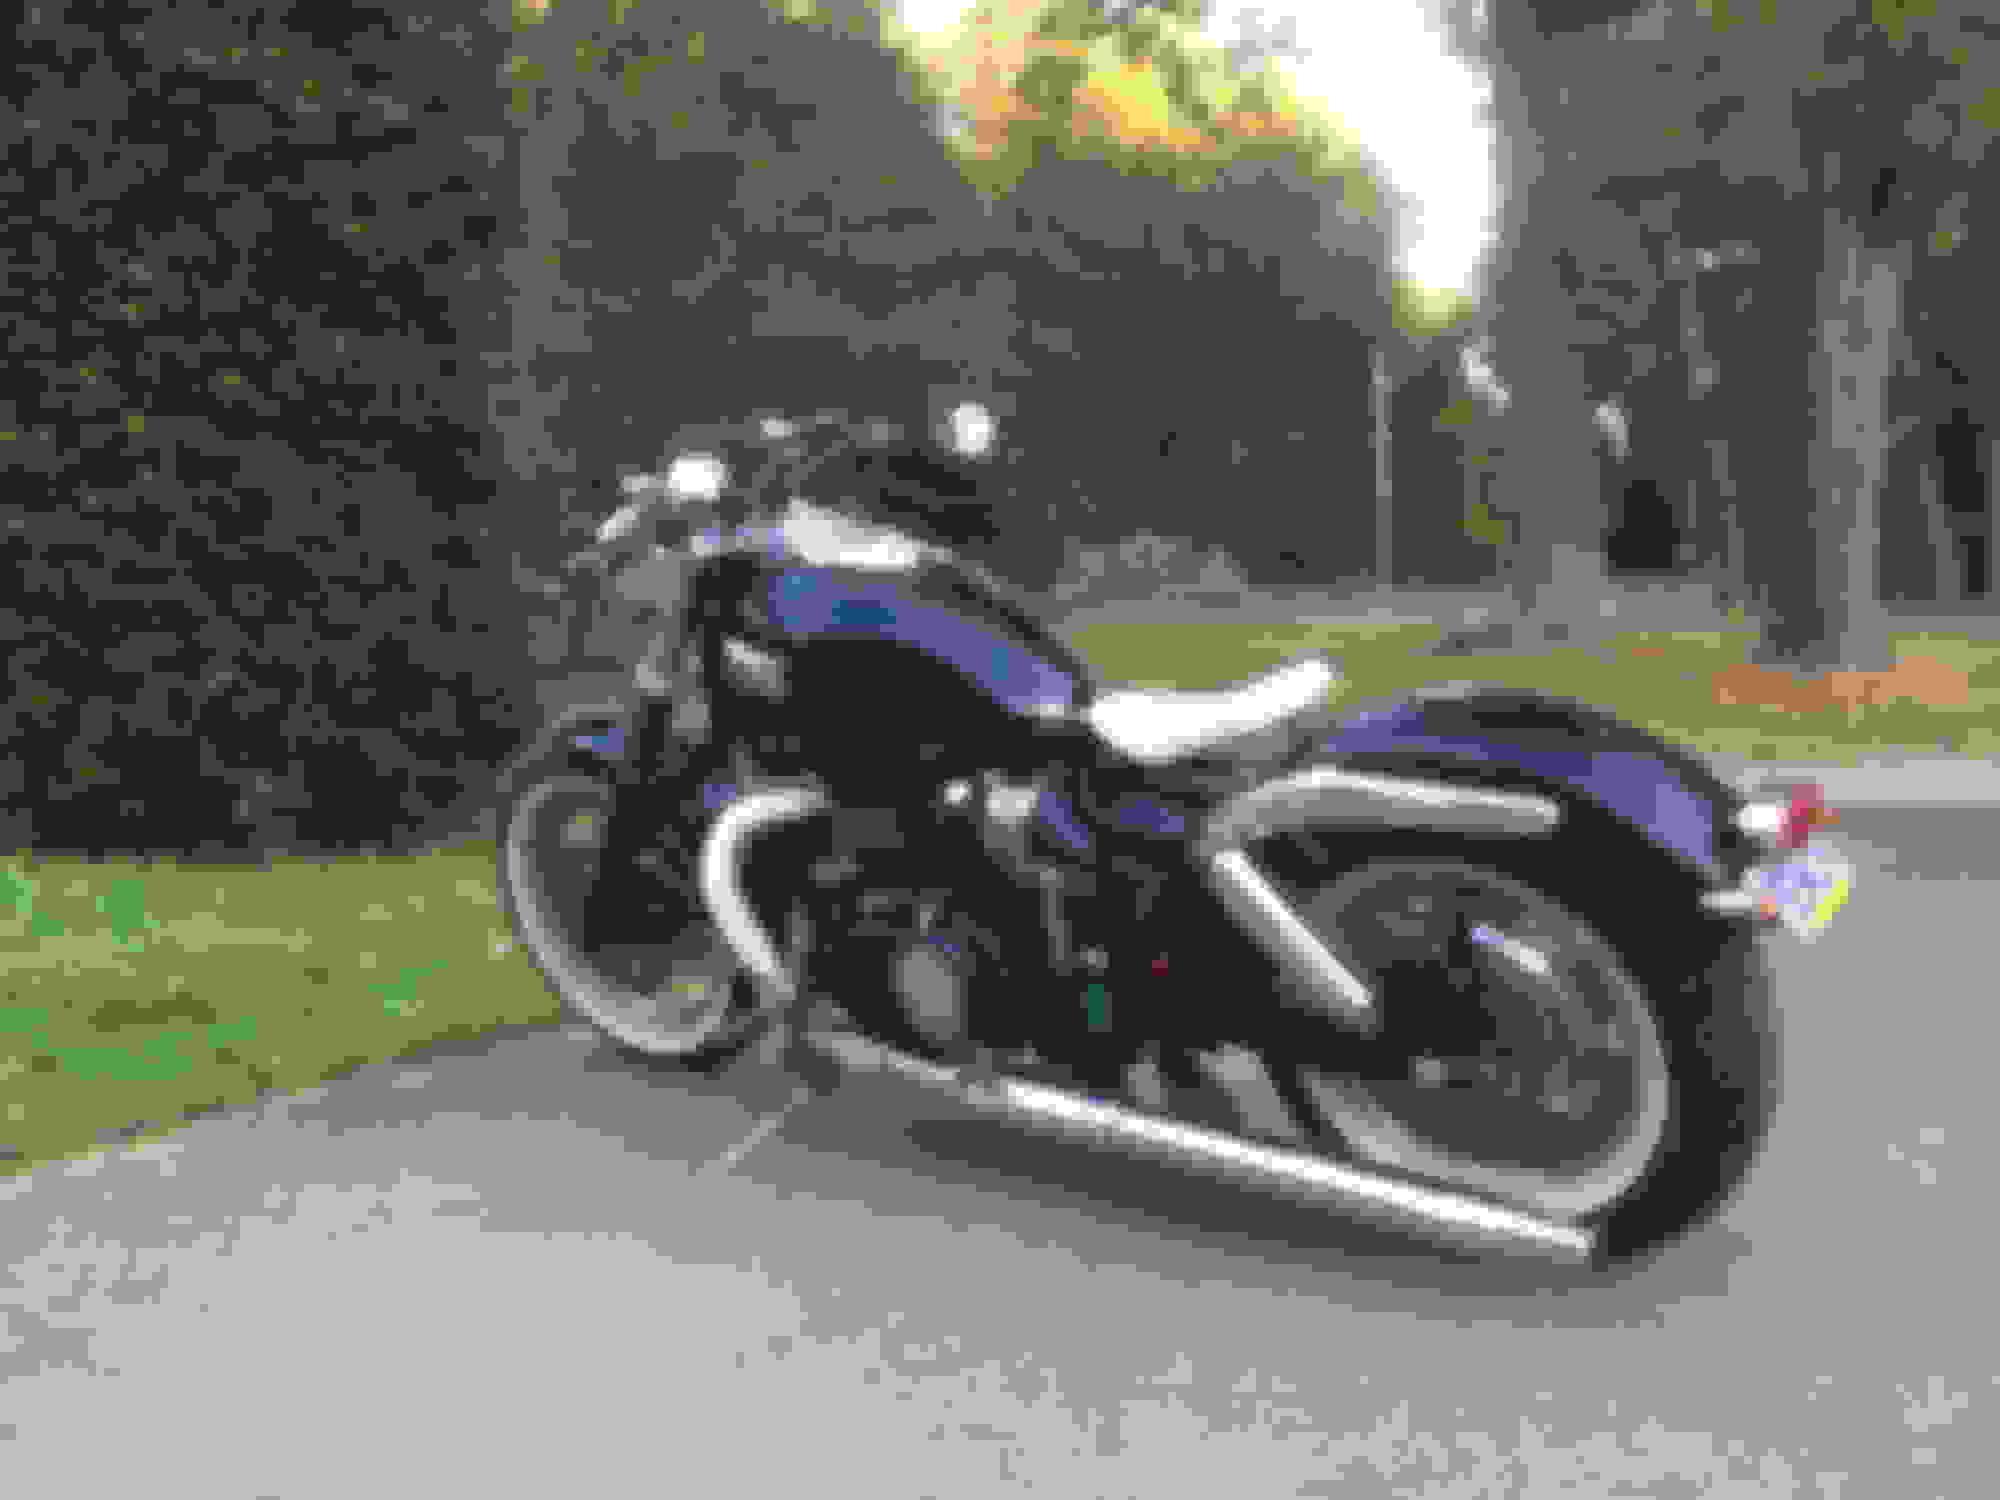 MT net Motorcycle Thread - Page 55 - Miata Turbo Forum - Boost cars